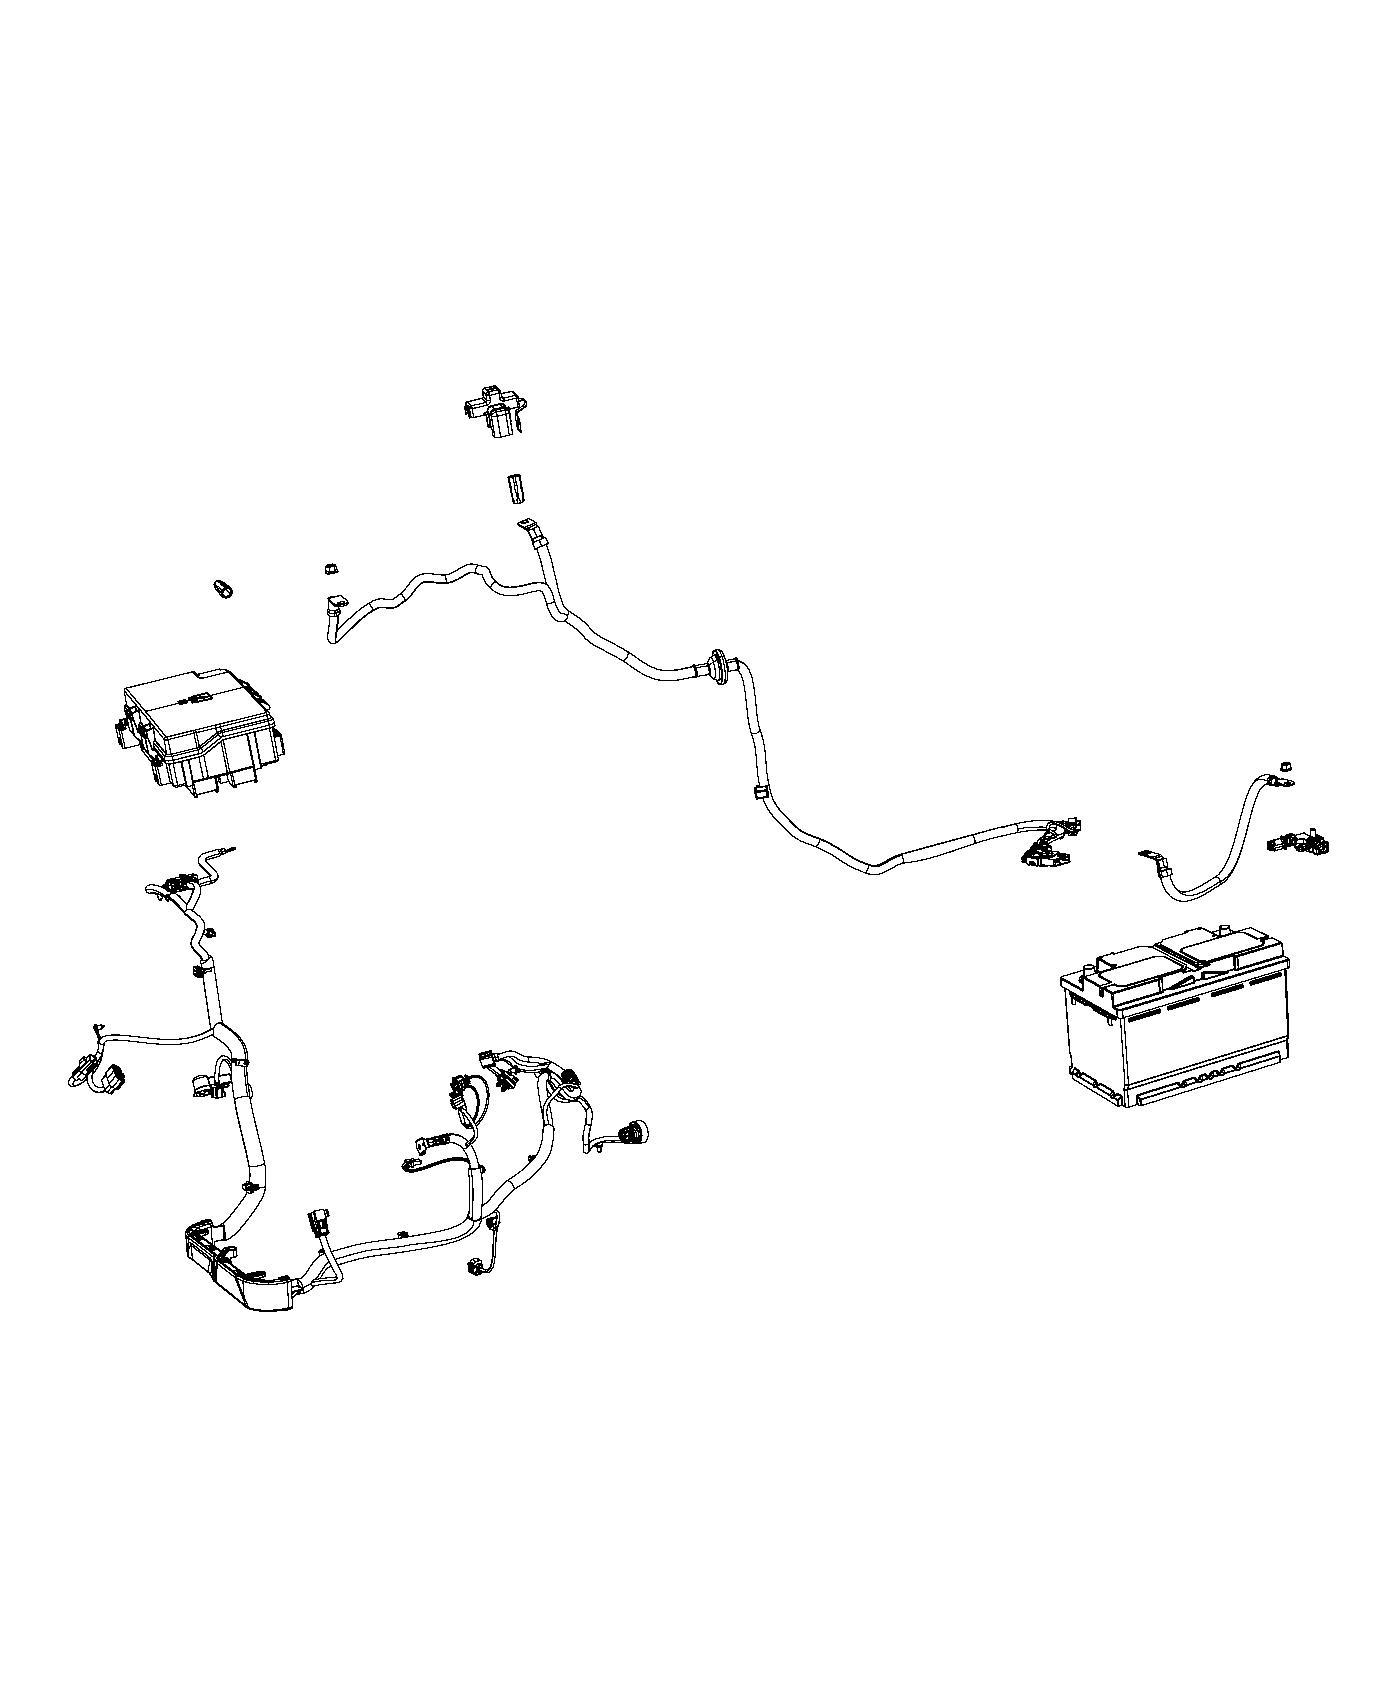 Jeep Grand Cherokee Wiring  Alternator Starter Power Distribution Center  Export